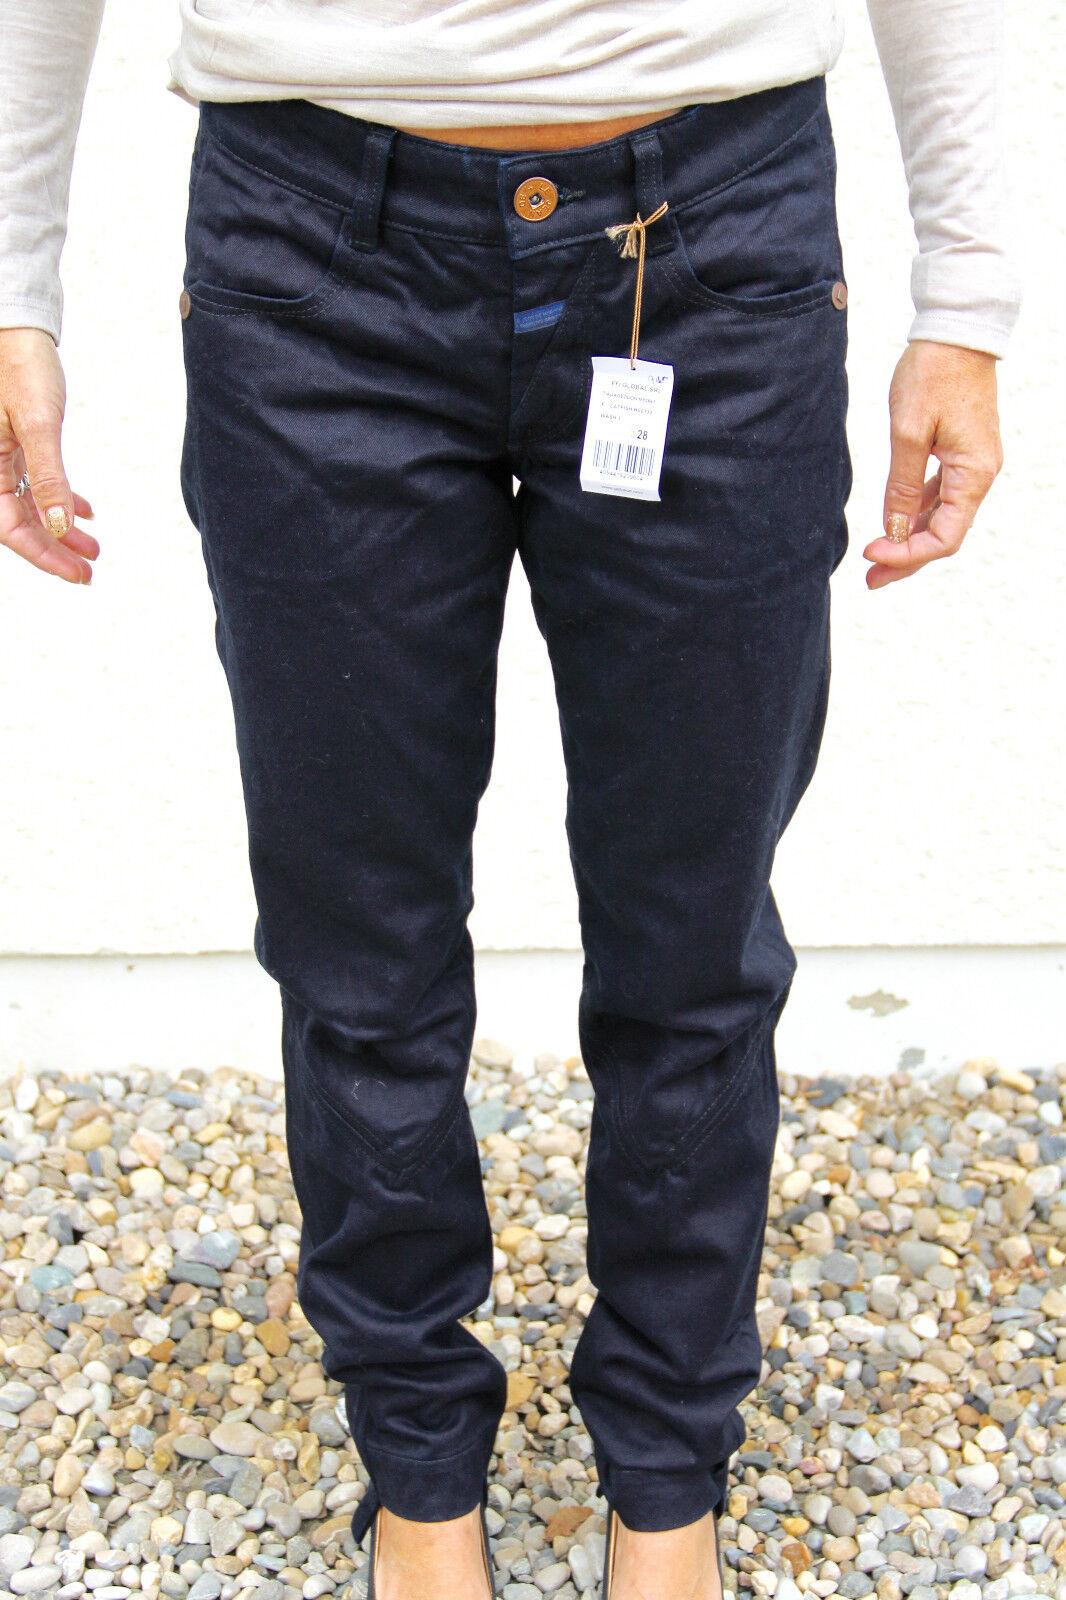 Jeans slim marine M&F GIRBAUD tiagageddon size 28 (38) NEUF prix boutique